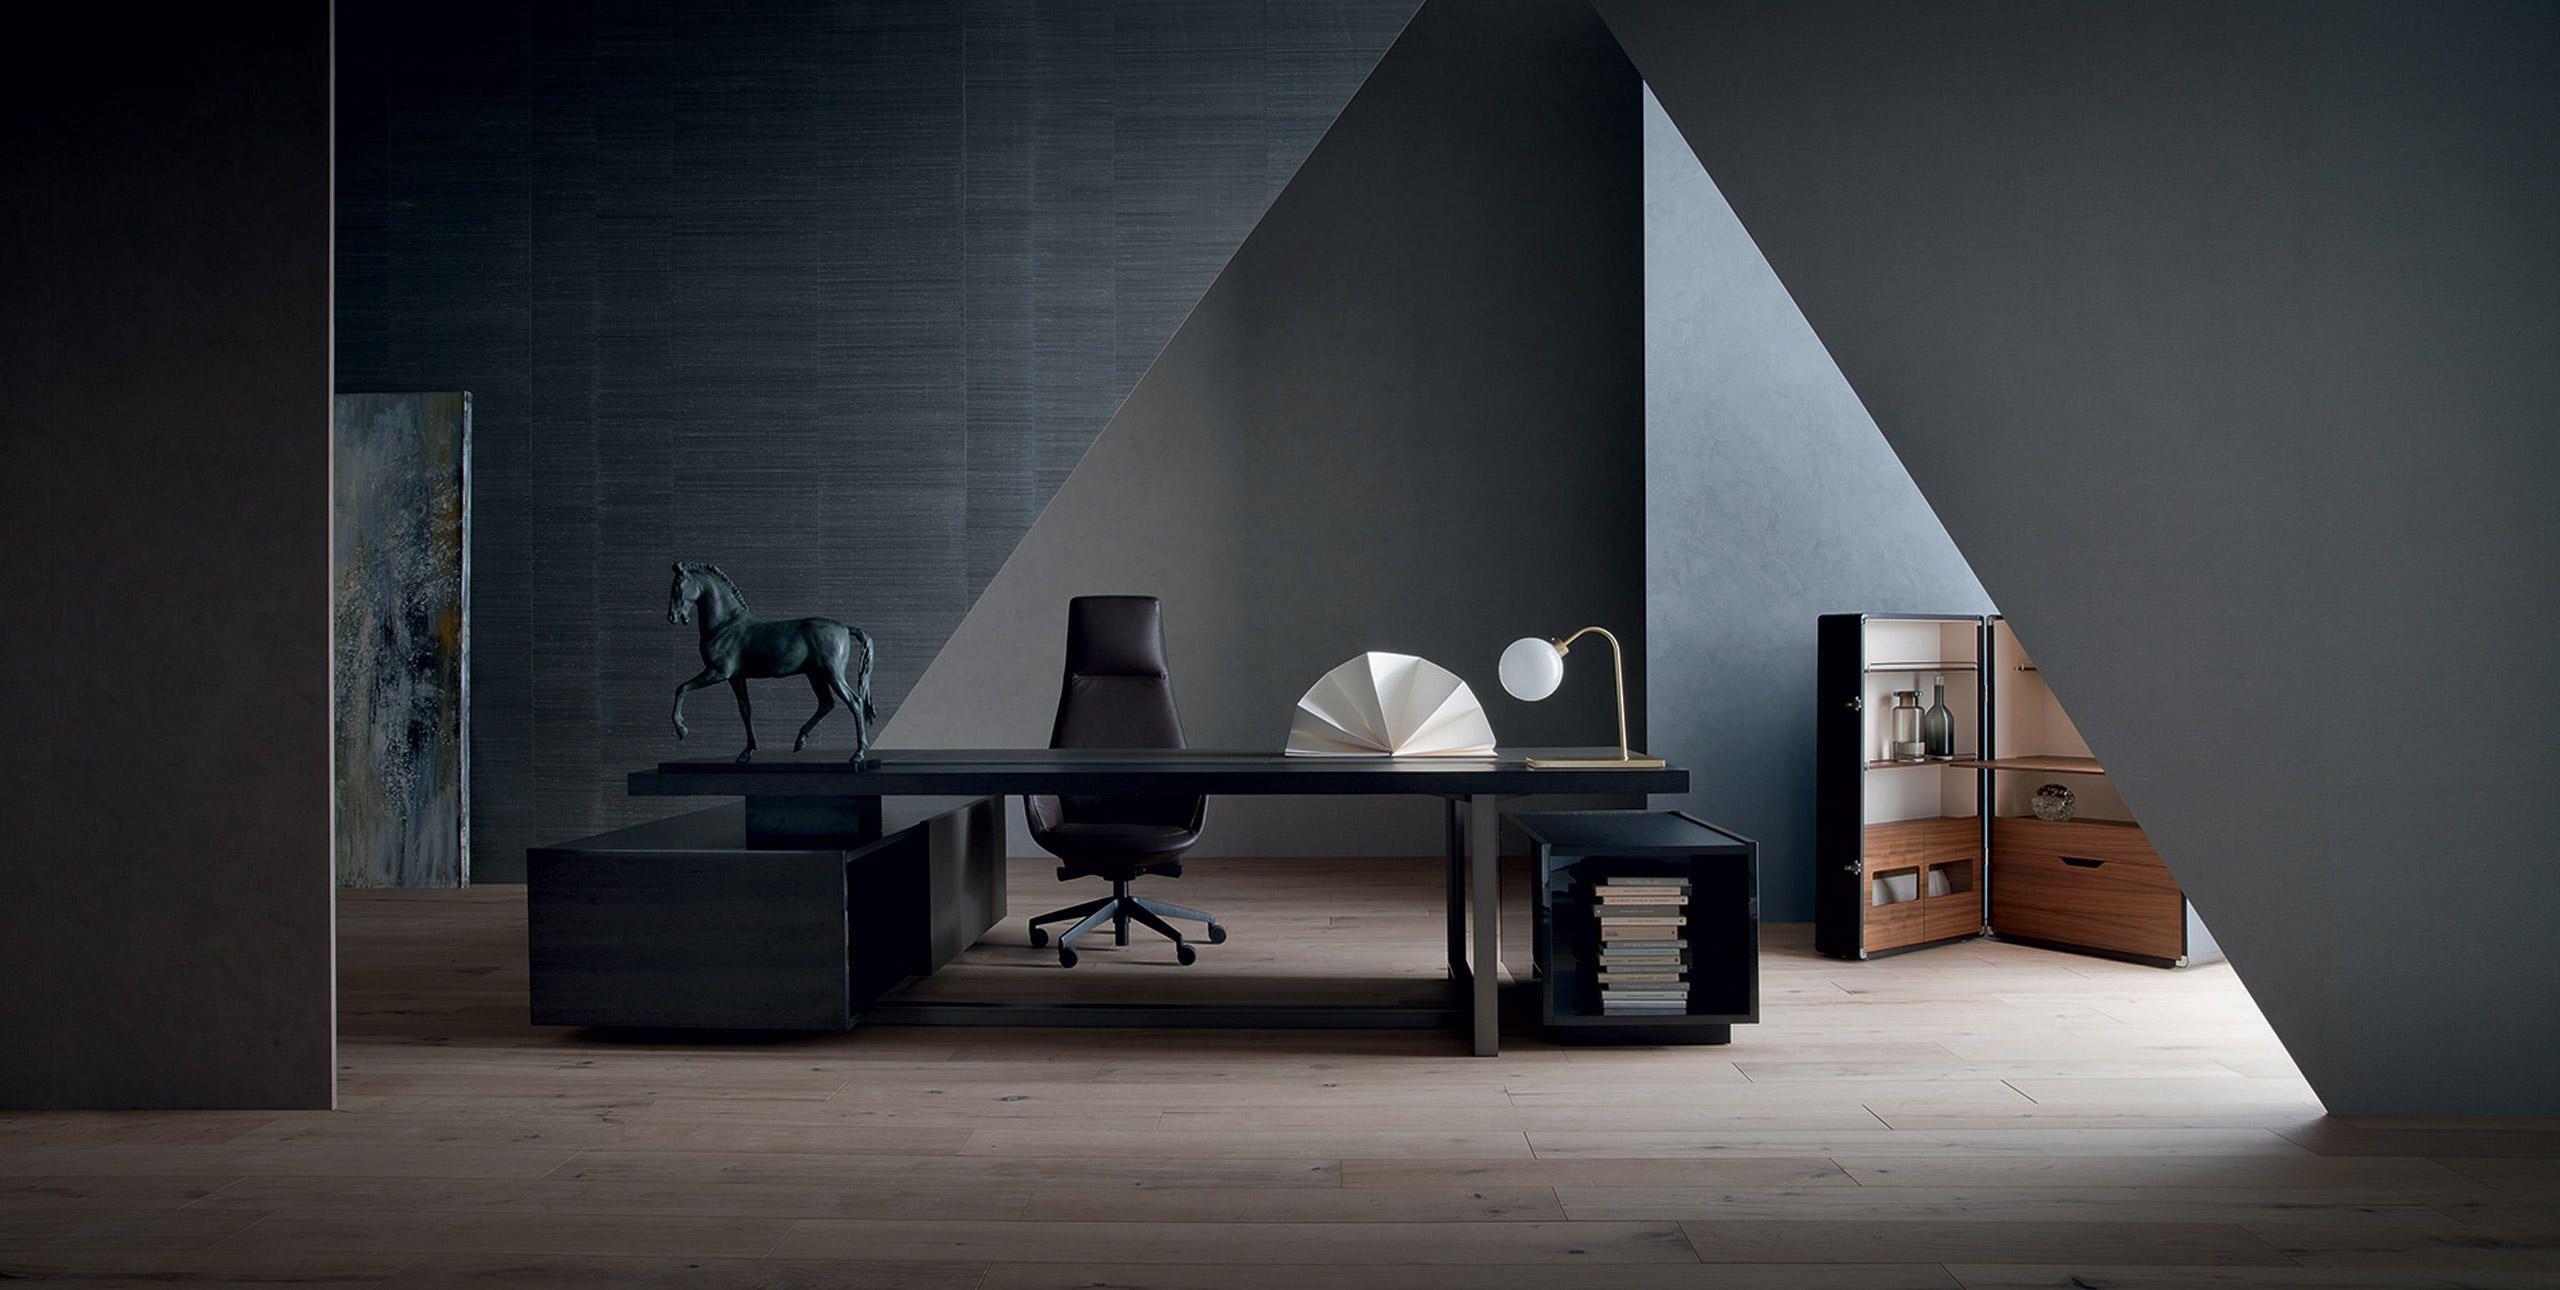 Ufficio Elegante Jobs : Jobs desk by poltrona frau design rodolfo dordoni workplace